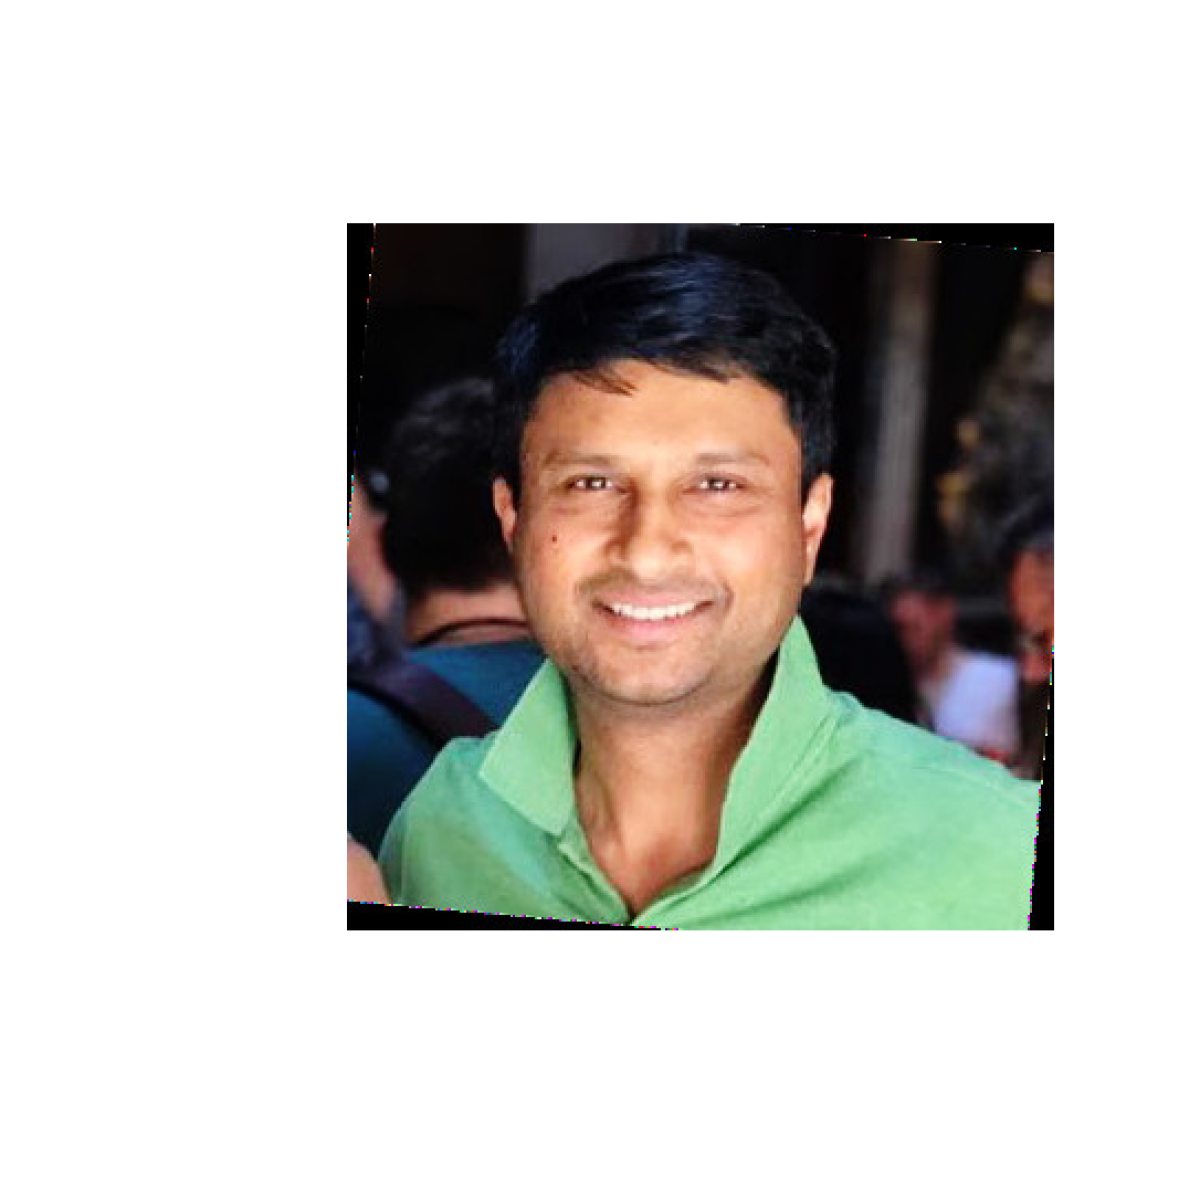 Truecaller appoints Rishit Jhunjhunwala as managing director of India unit